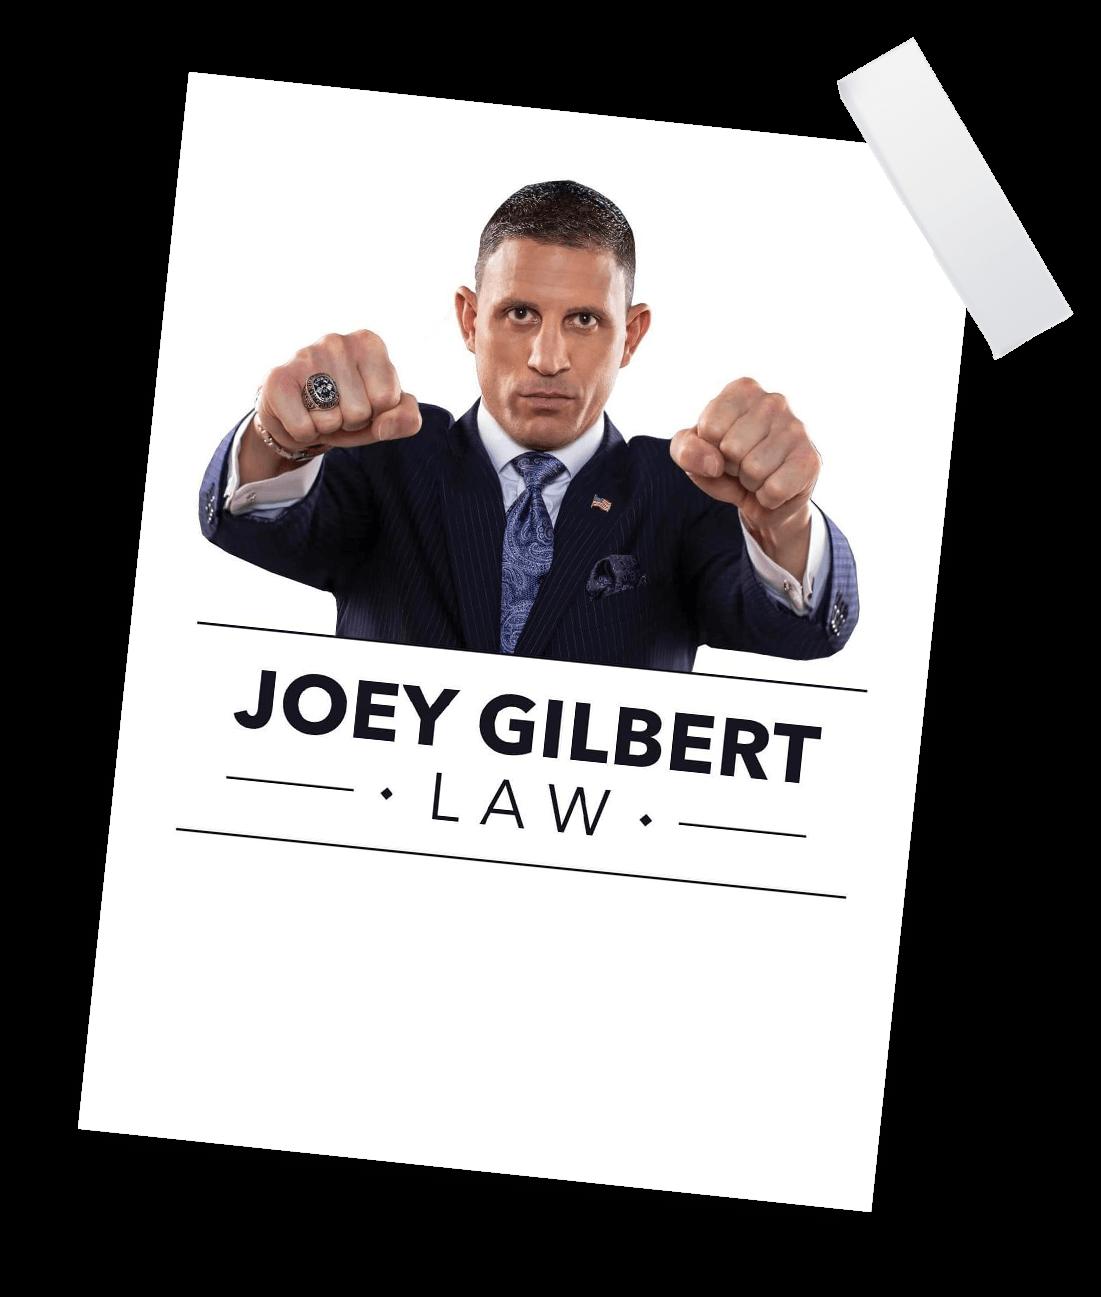 joey gilbert fighting